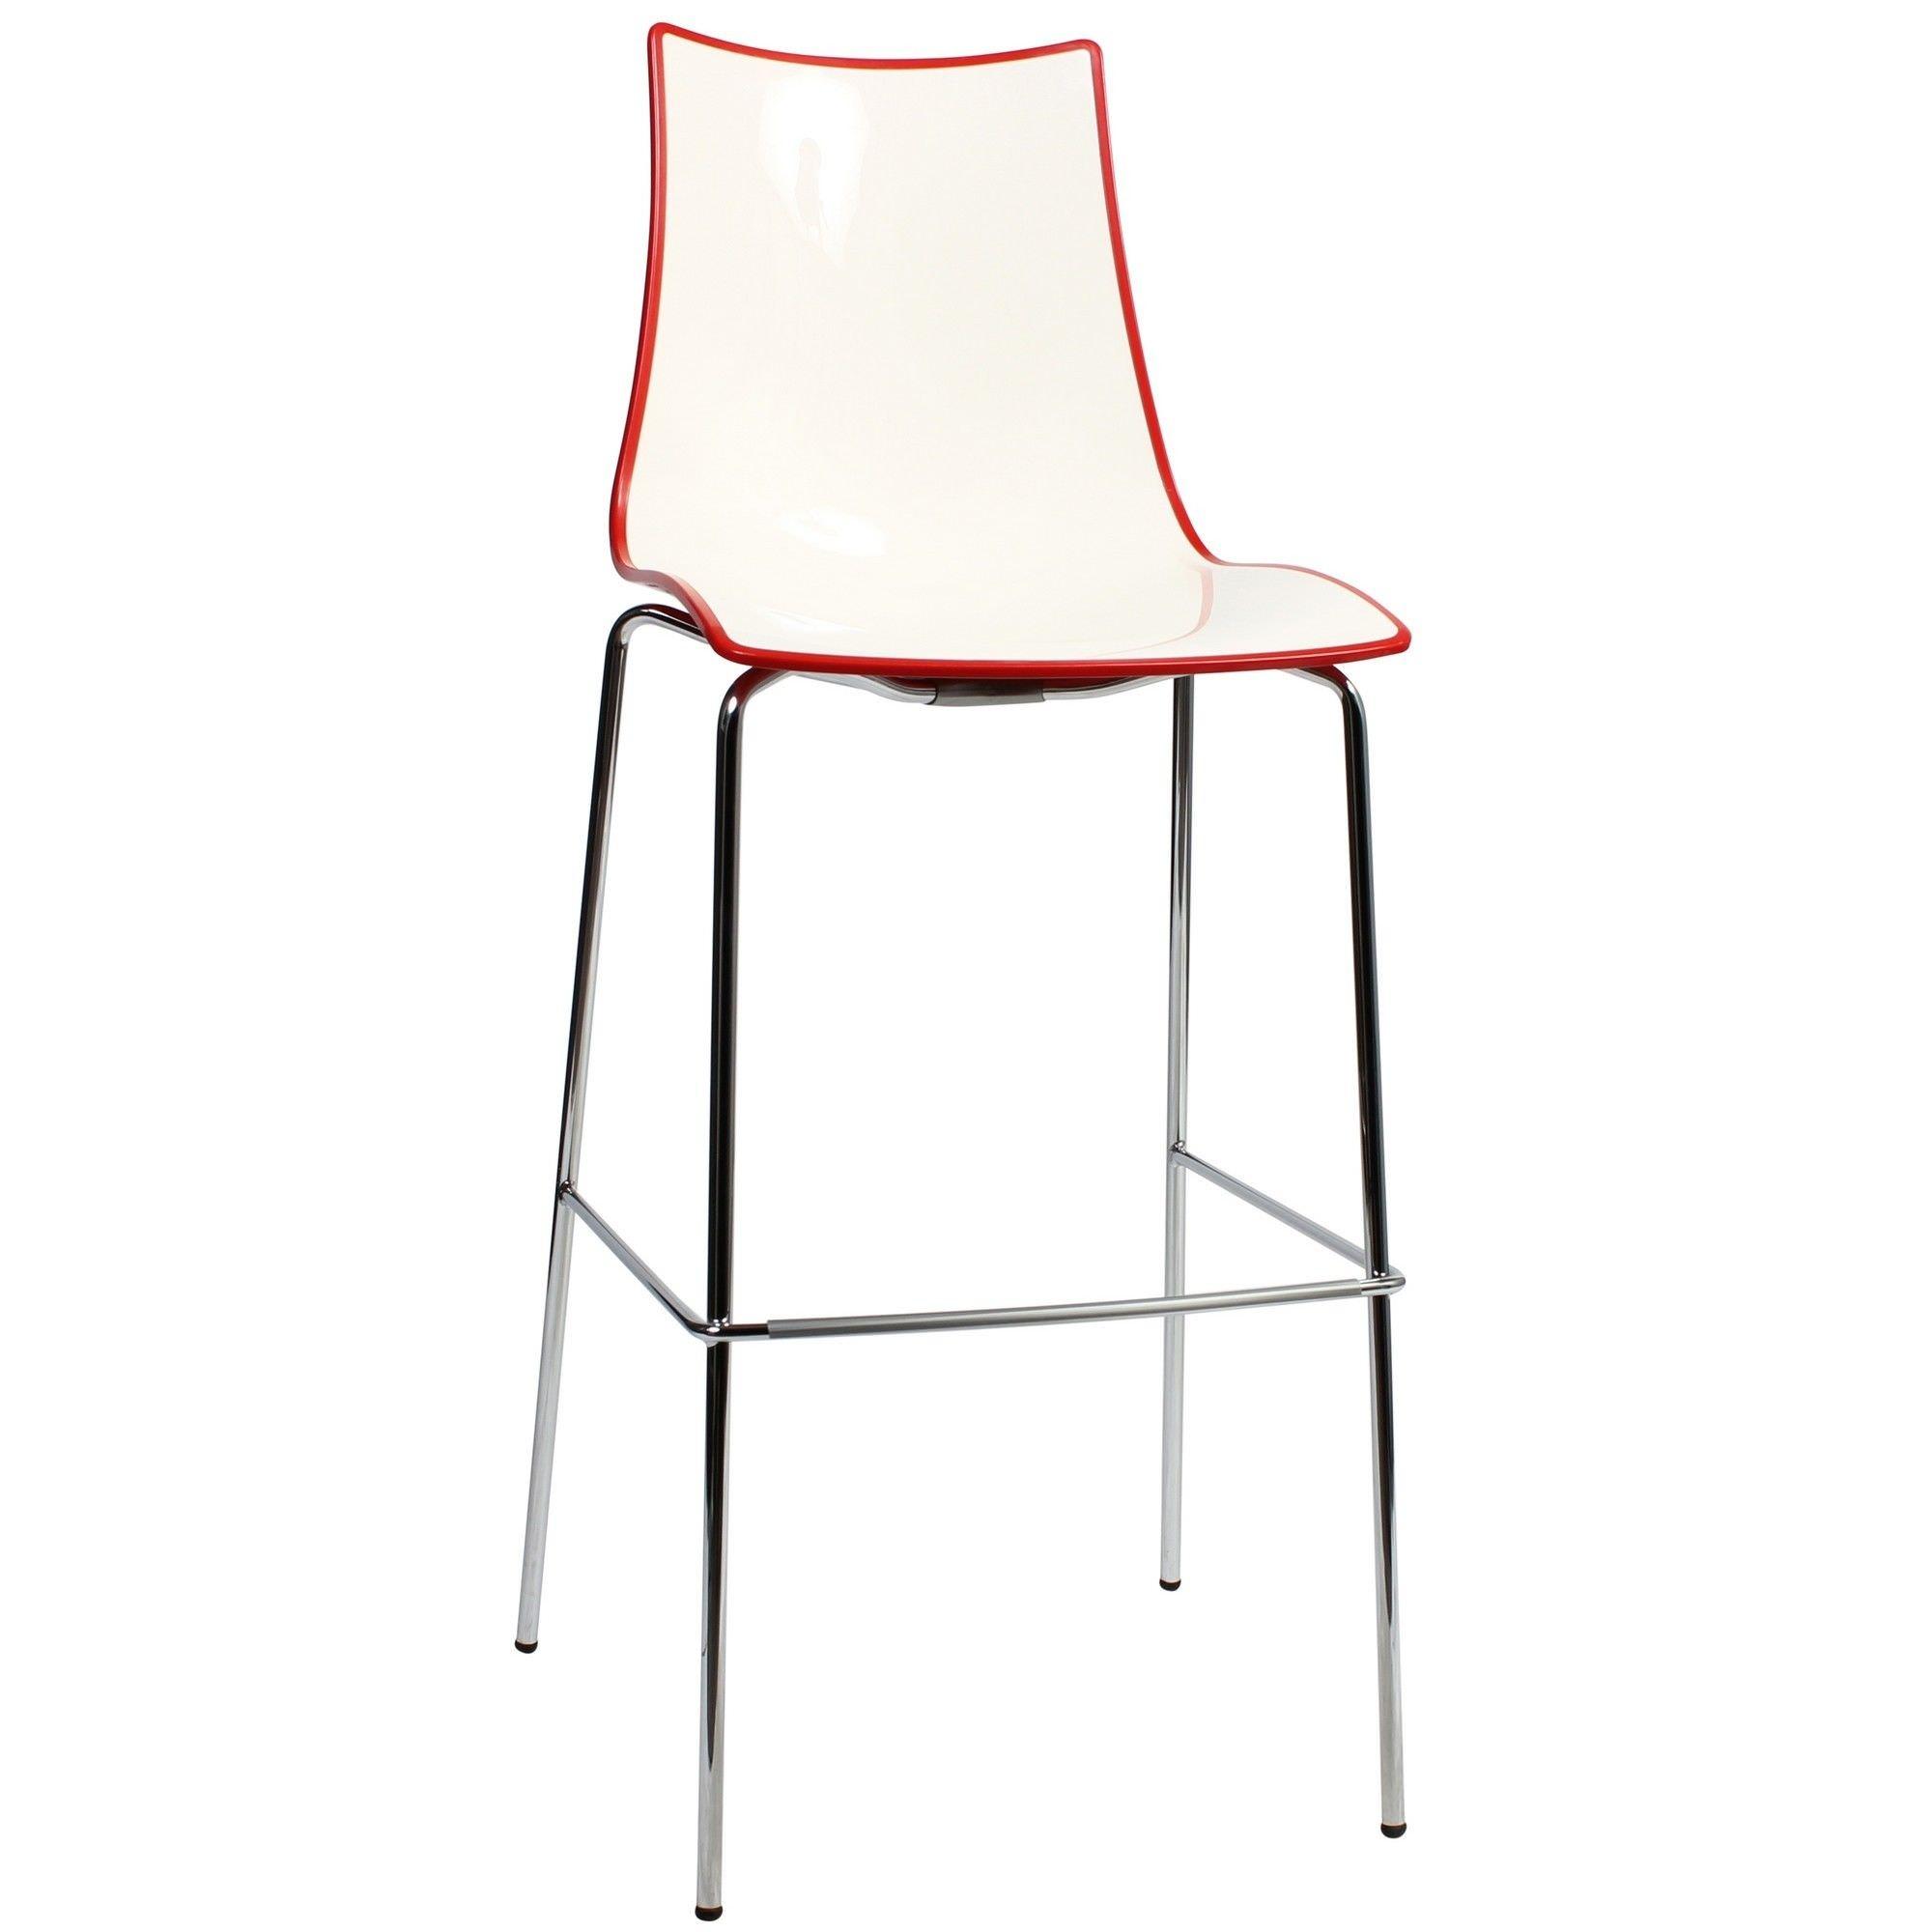 Zebra Bicolore Italian Made Commercial Grade Bar Stool, Metal Leg, Red / Chrome